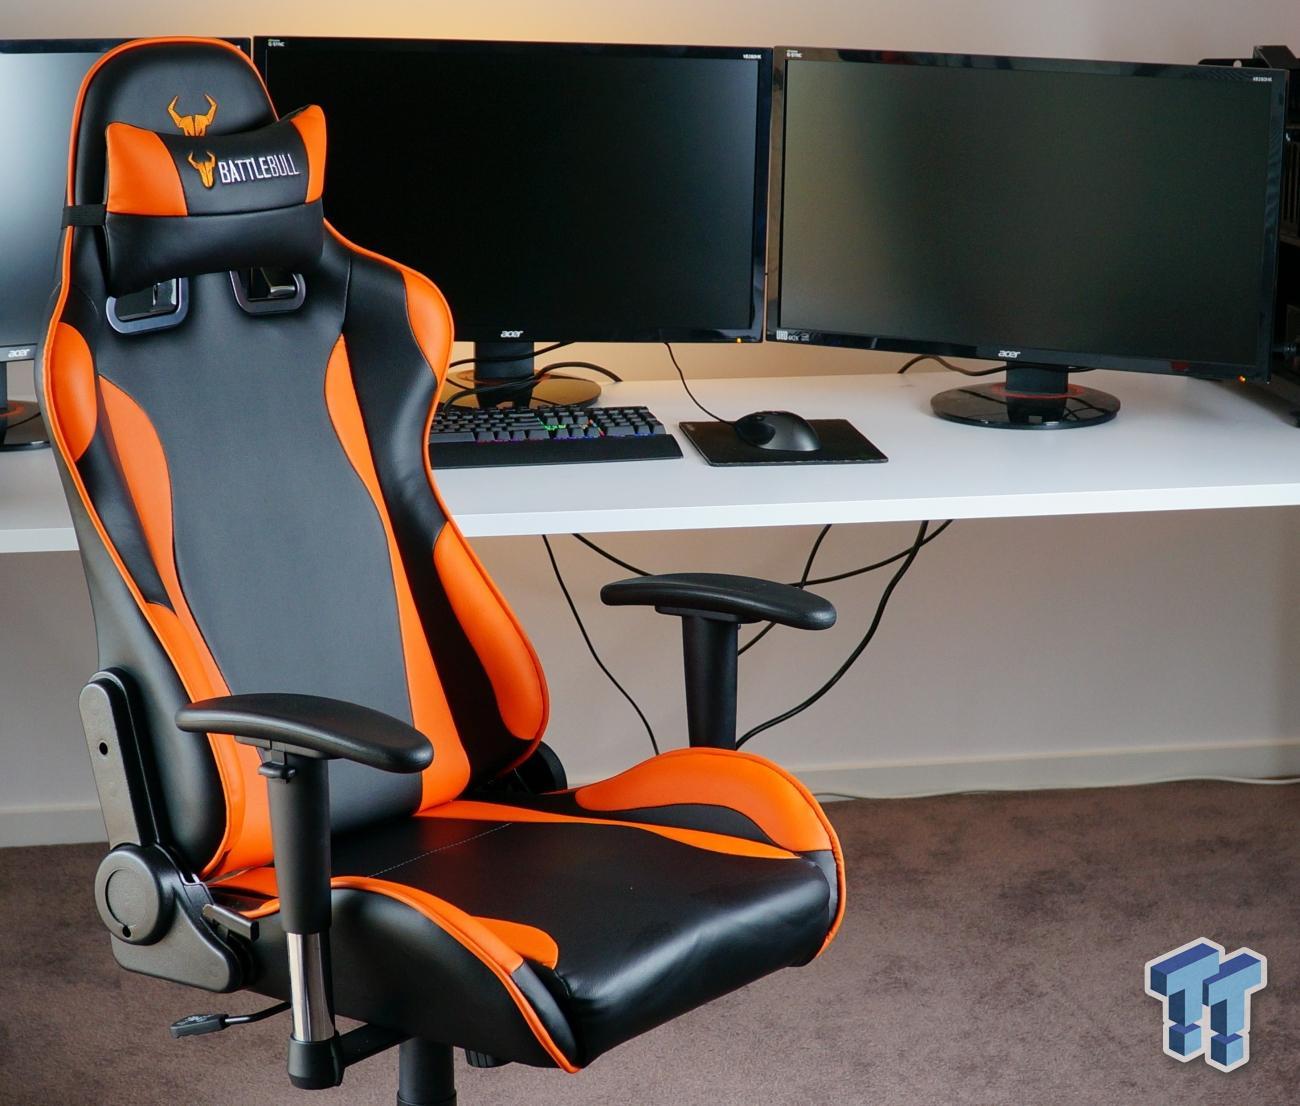 gaming chair review dark teal covers battlebull combat